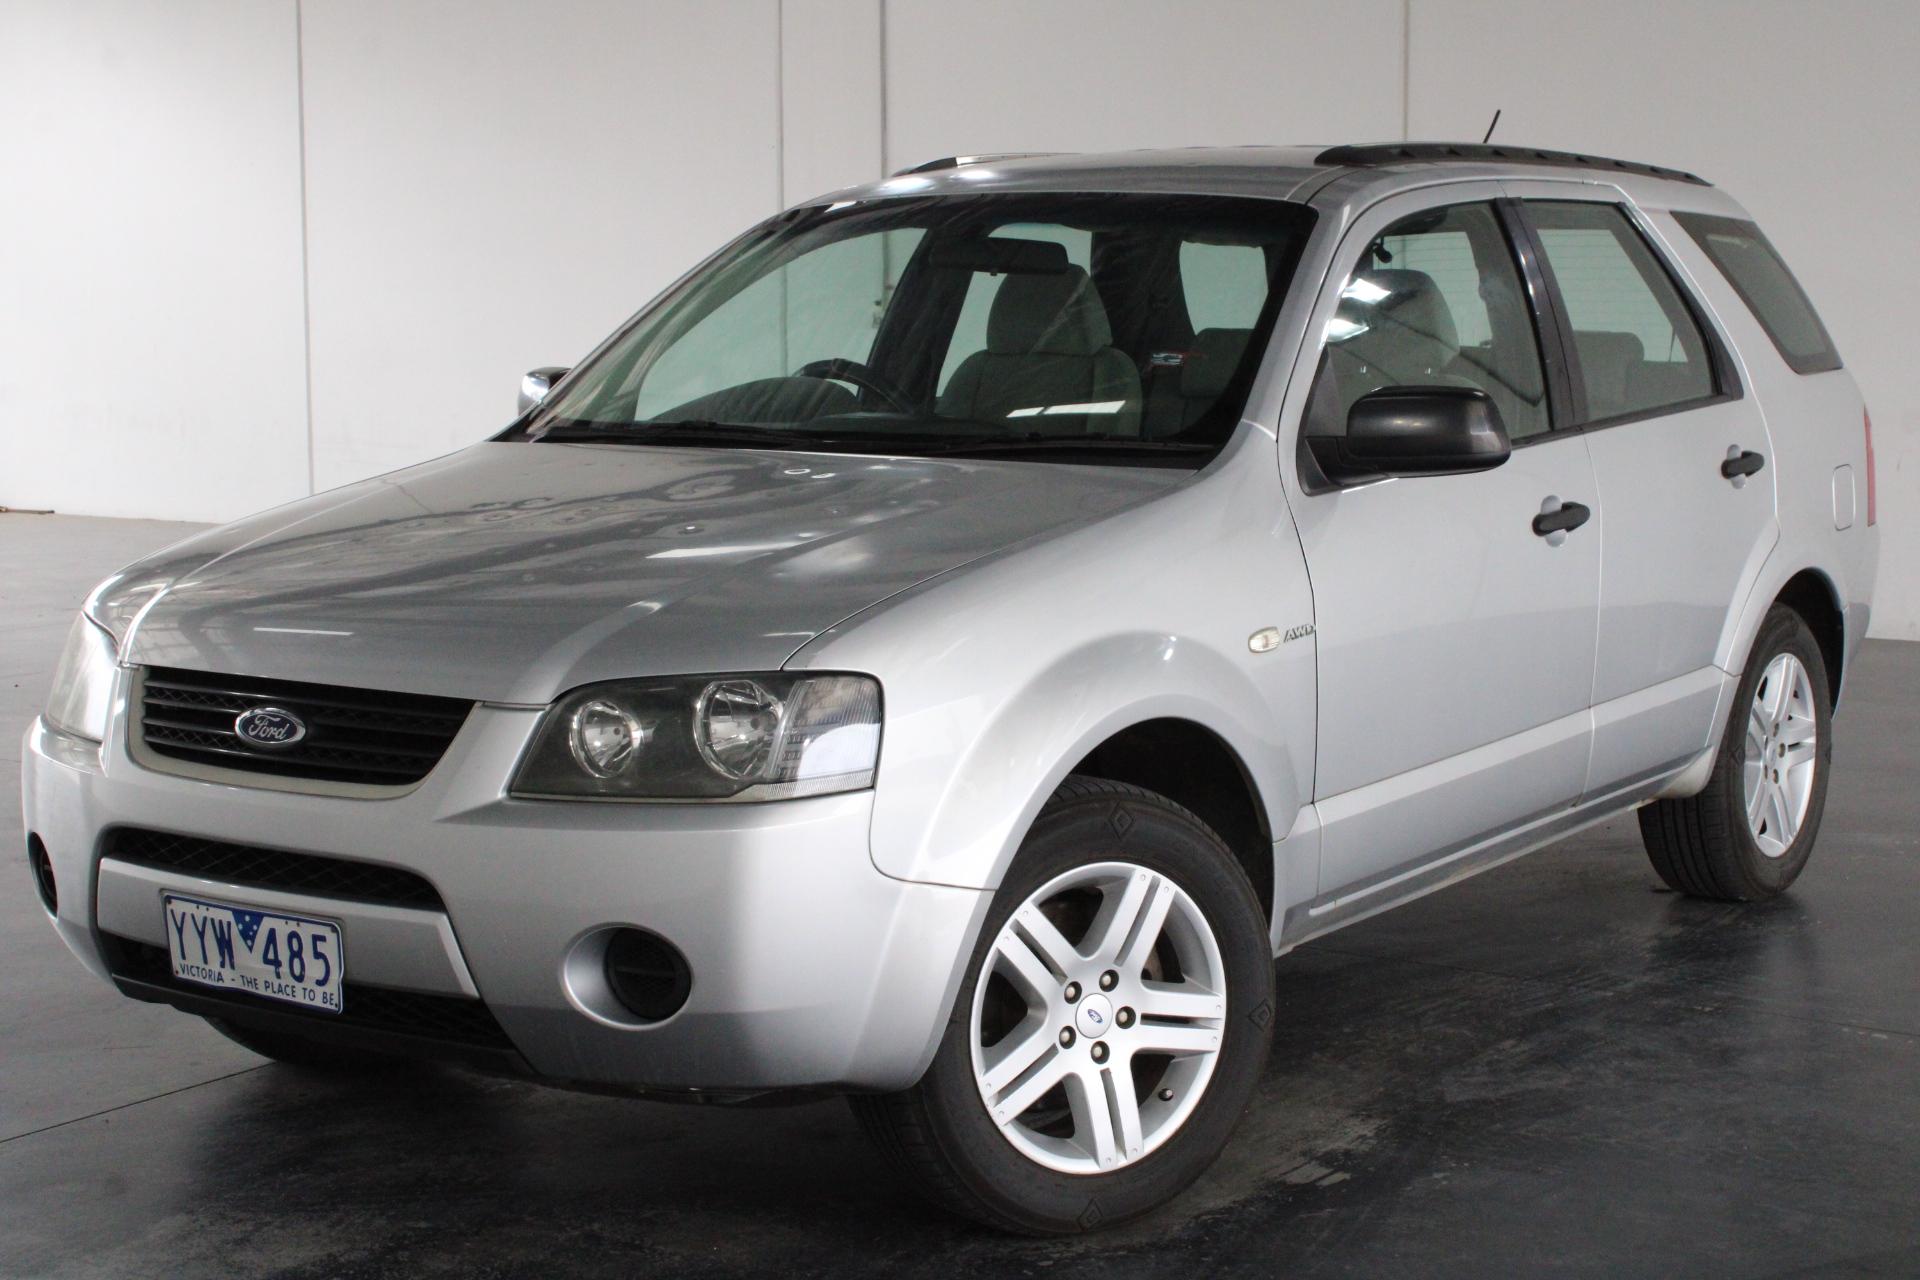 2004 Ford Territory TX (4x4) SX Automatic Wagon (WOVR)